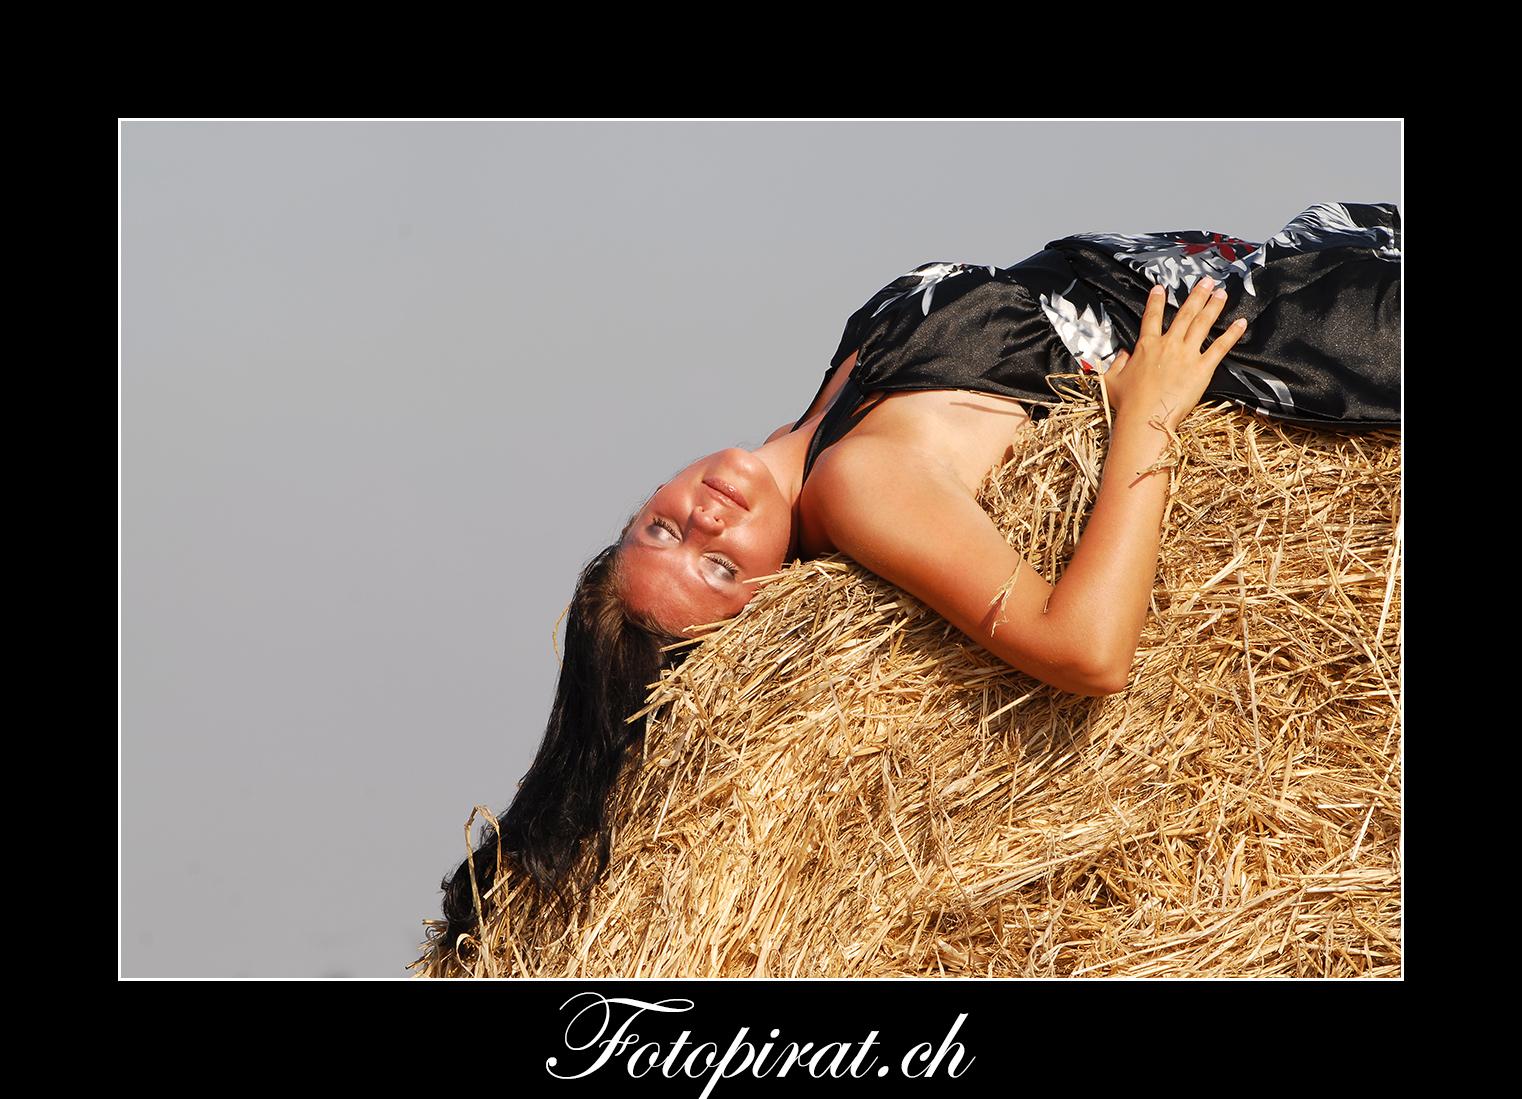 Fotoshooting, outdoor, Modelagentur, sexy Model, Fitnessmodel, Ballkleid, braunes Fotomodel